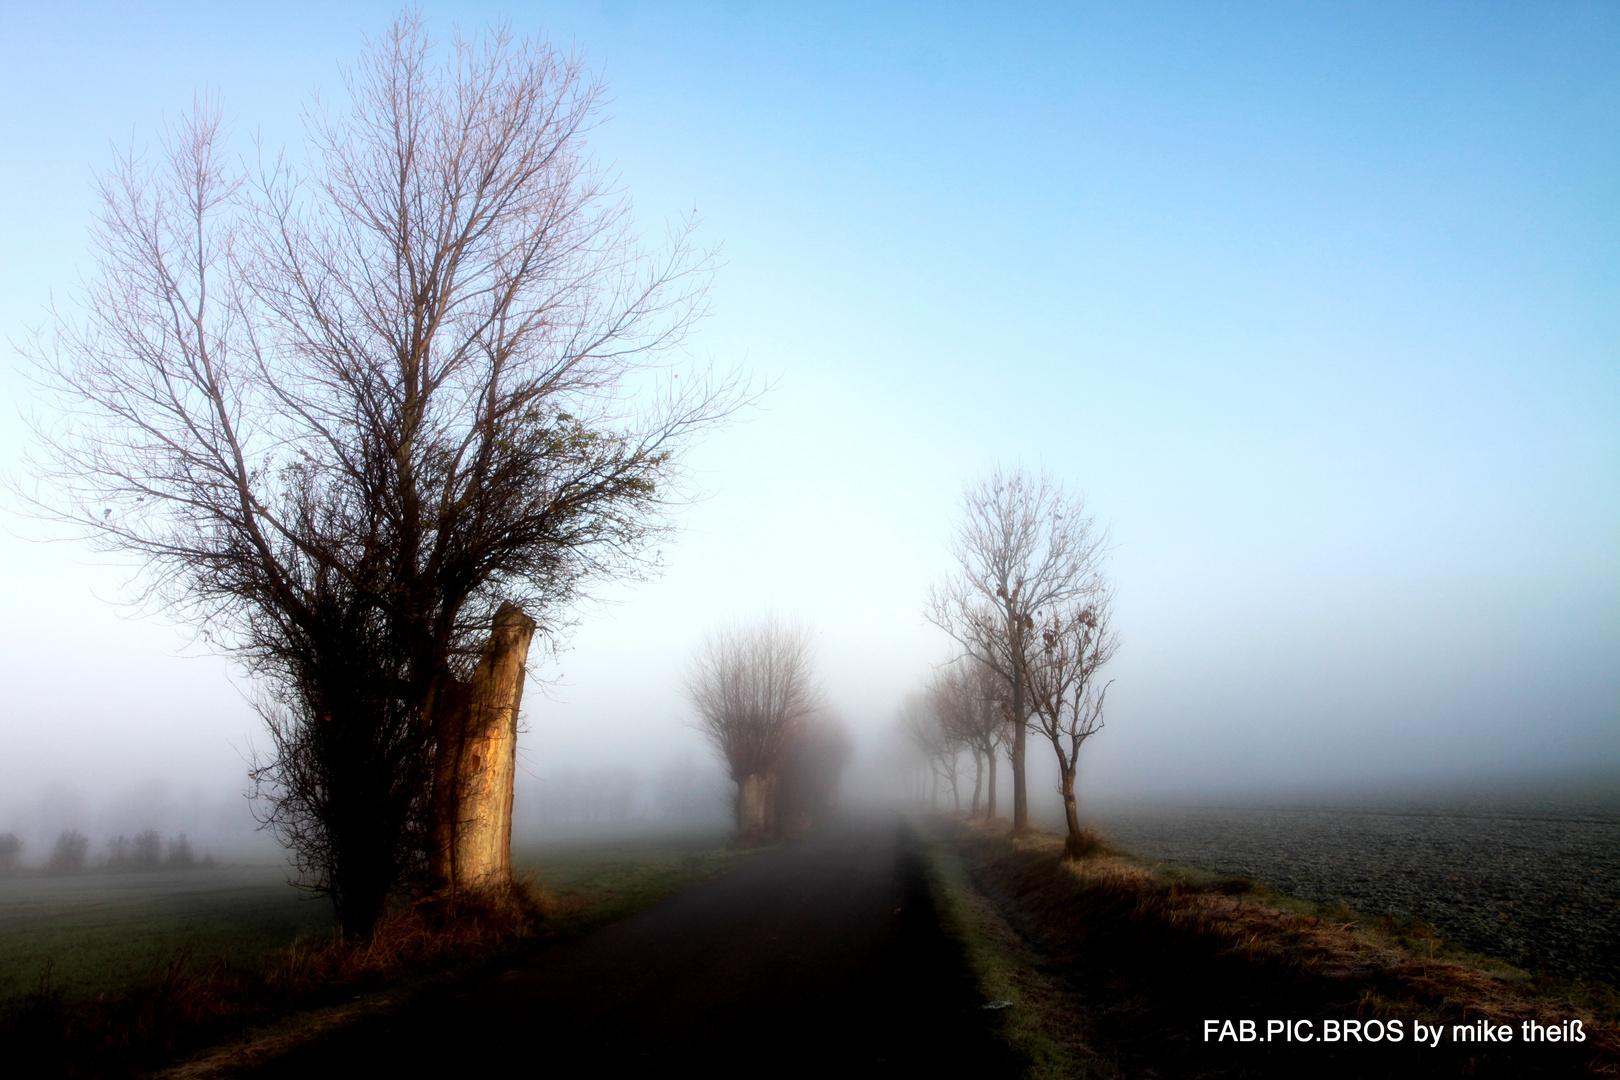 Nebel Bilder